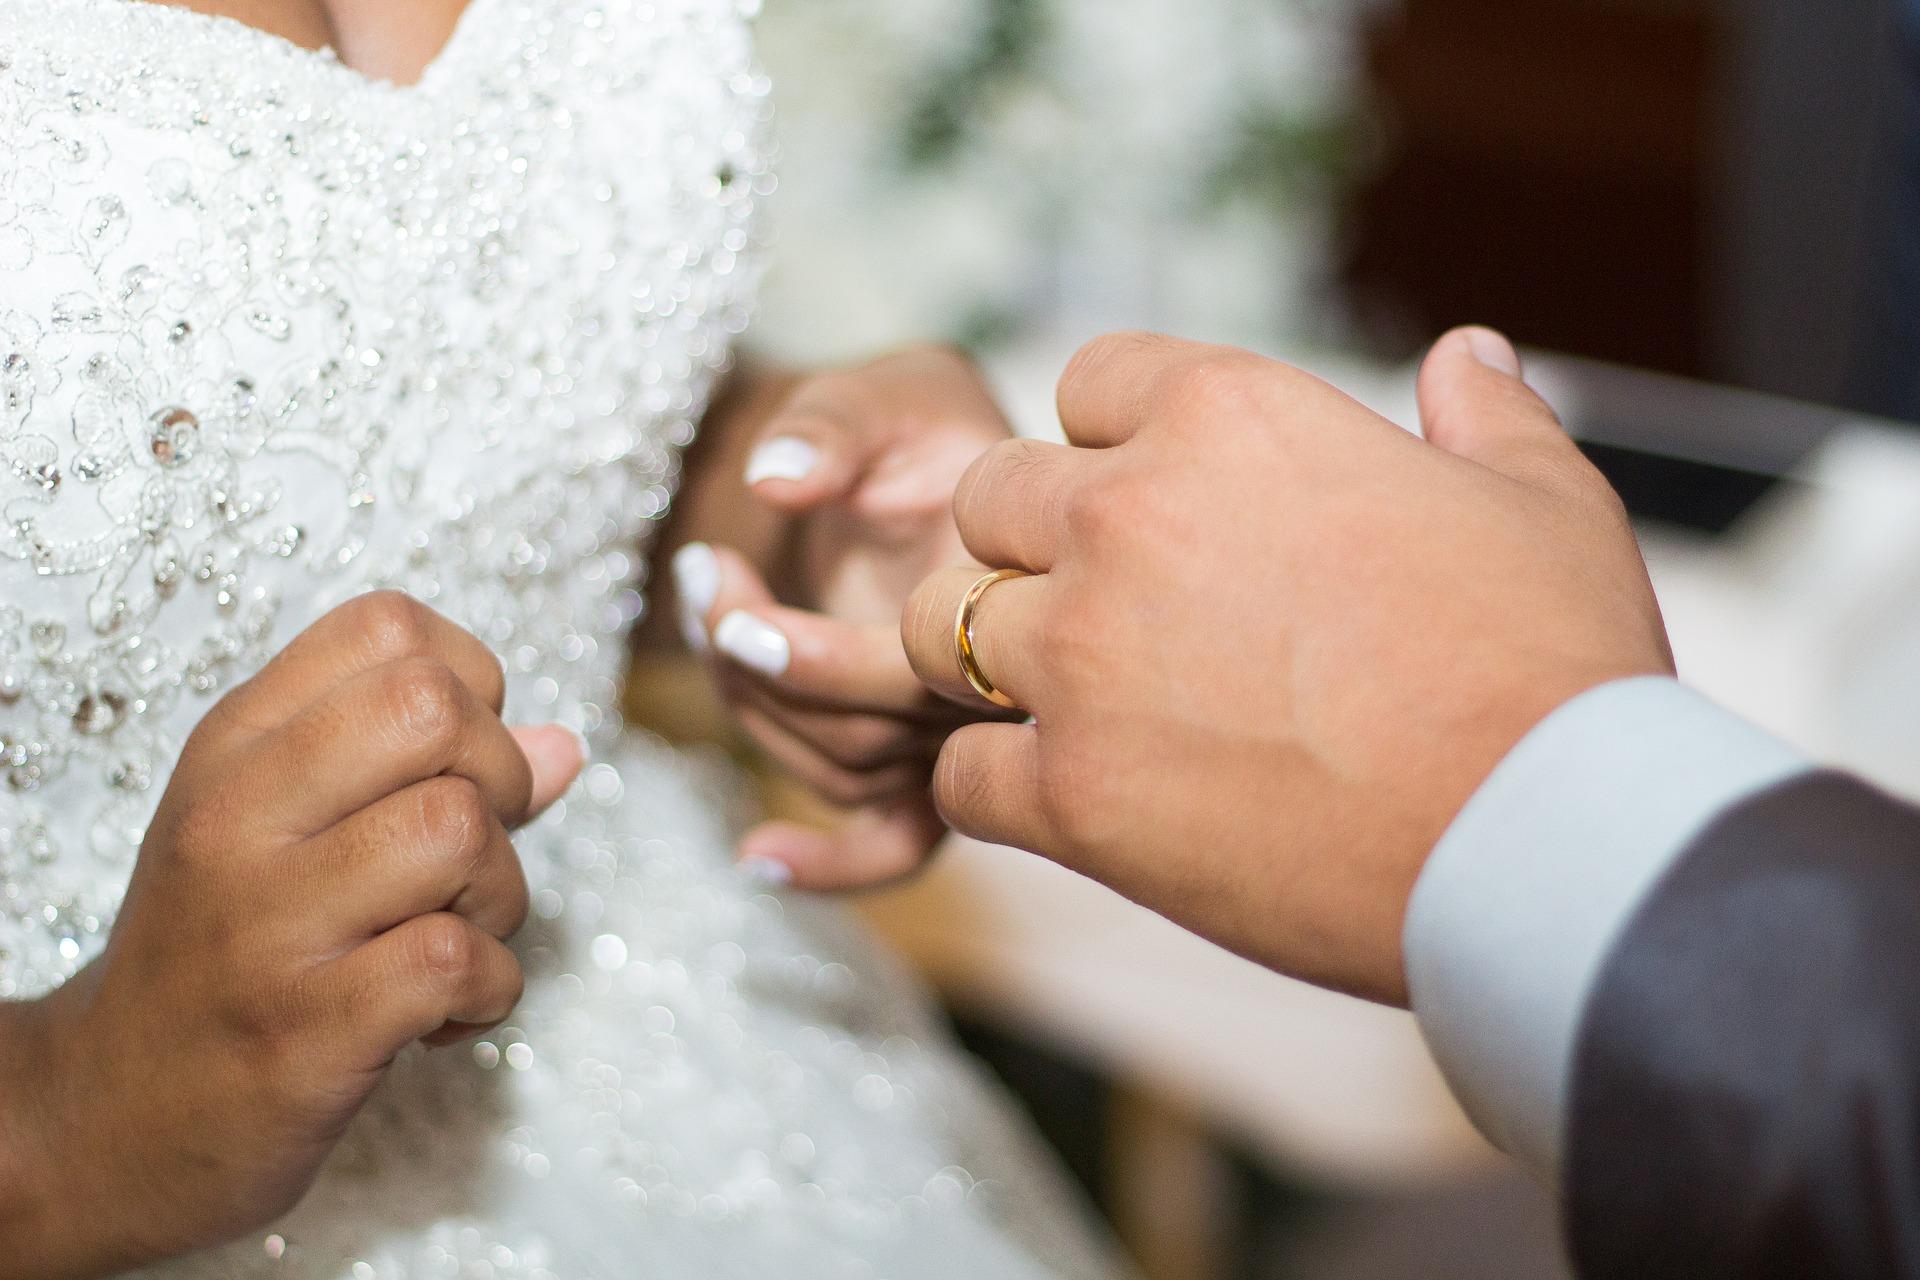 Druha Svatba Je 2x Casteji Domenou Muzu 7 Tipu Pro Druhou Svatbu